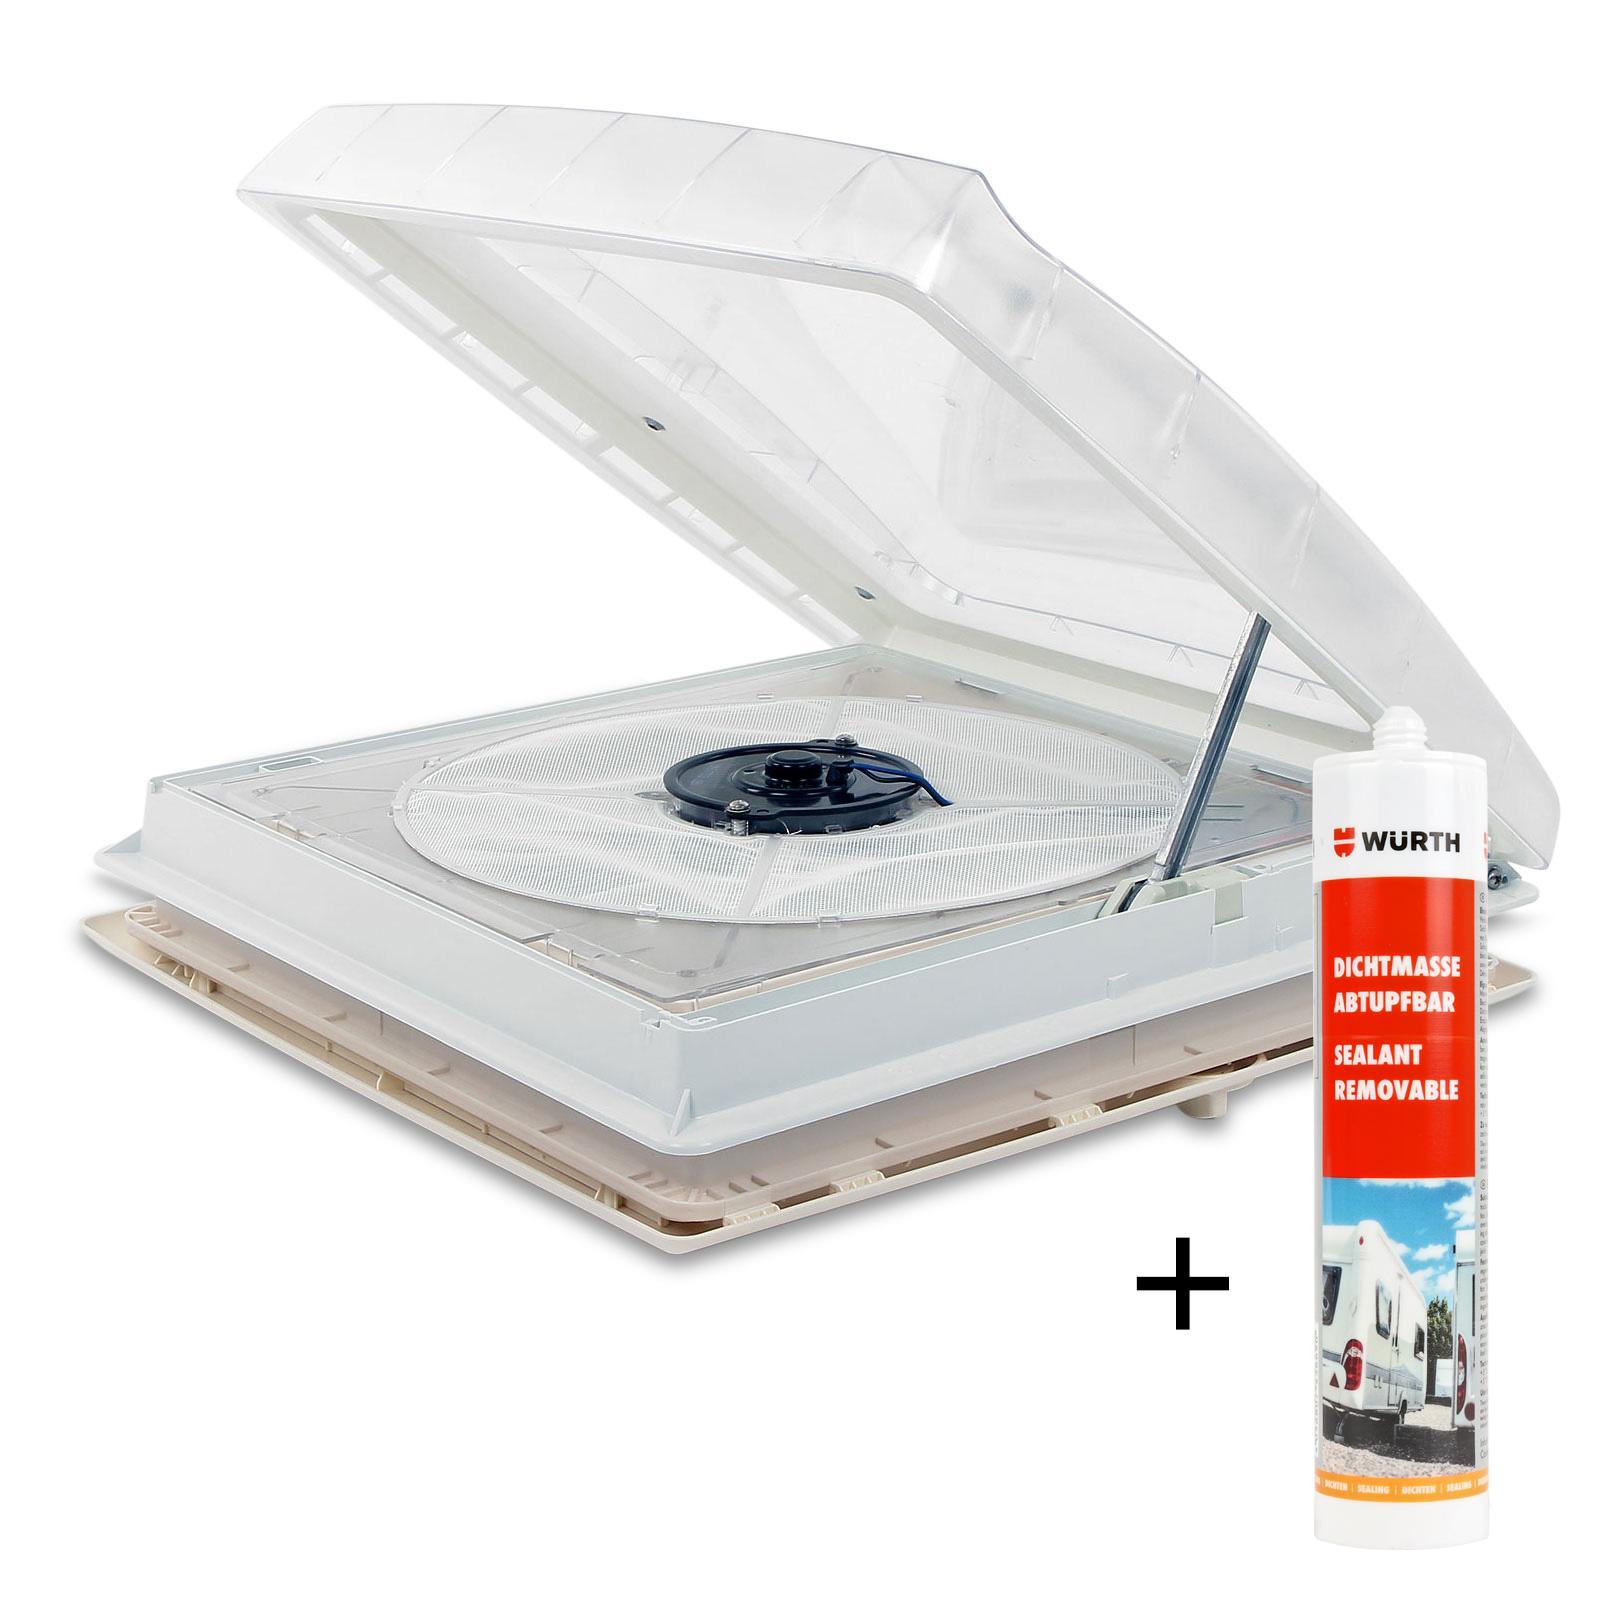 Thule® Kurbeldachhaube Omni-Vent transparent 40x40 12V Ventilator + Dichtmittel